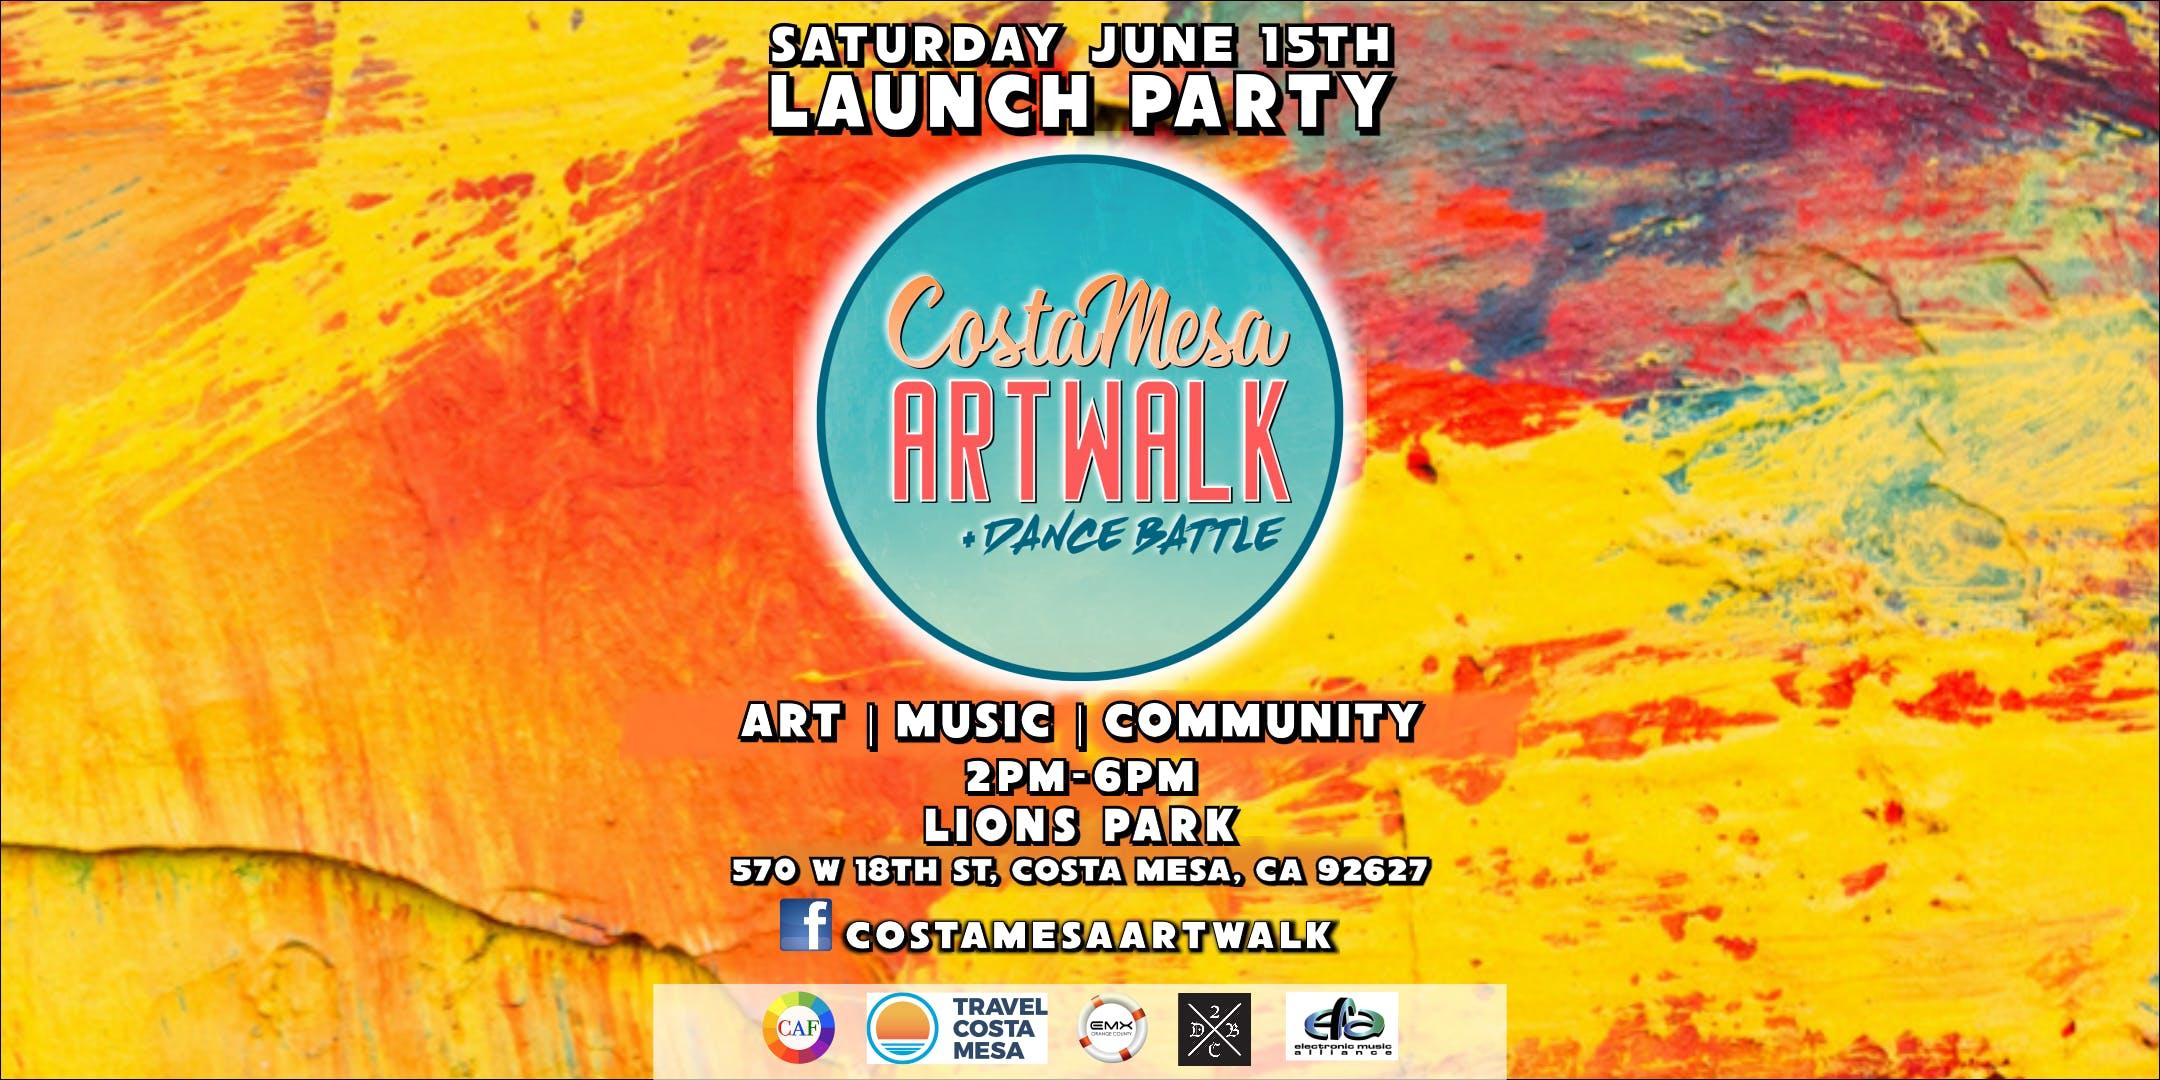 Costa Mesa ArtWalk + Dance Battle (3rd Saturdays) - The Art